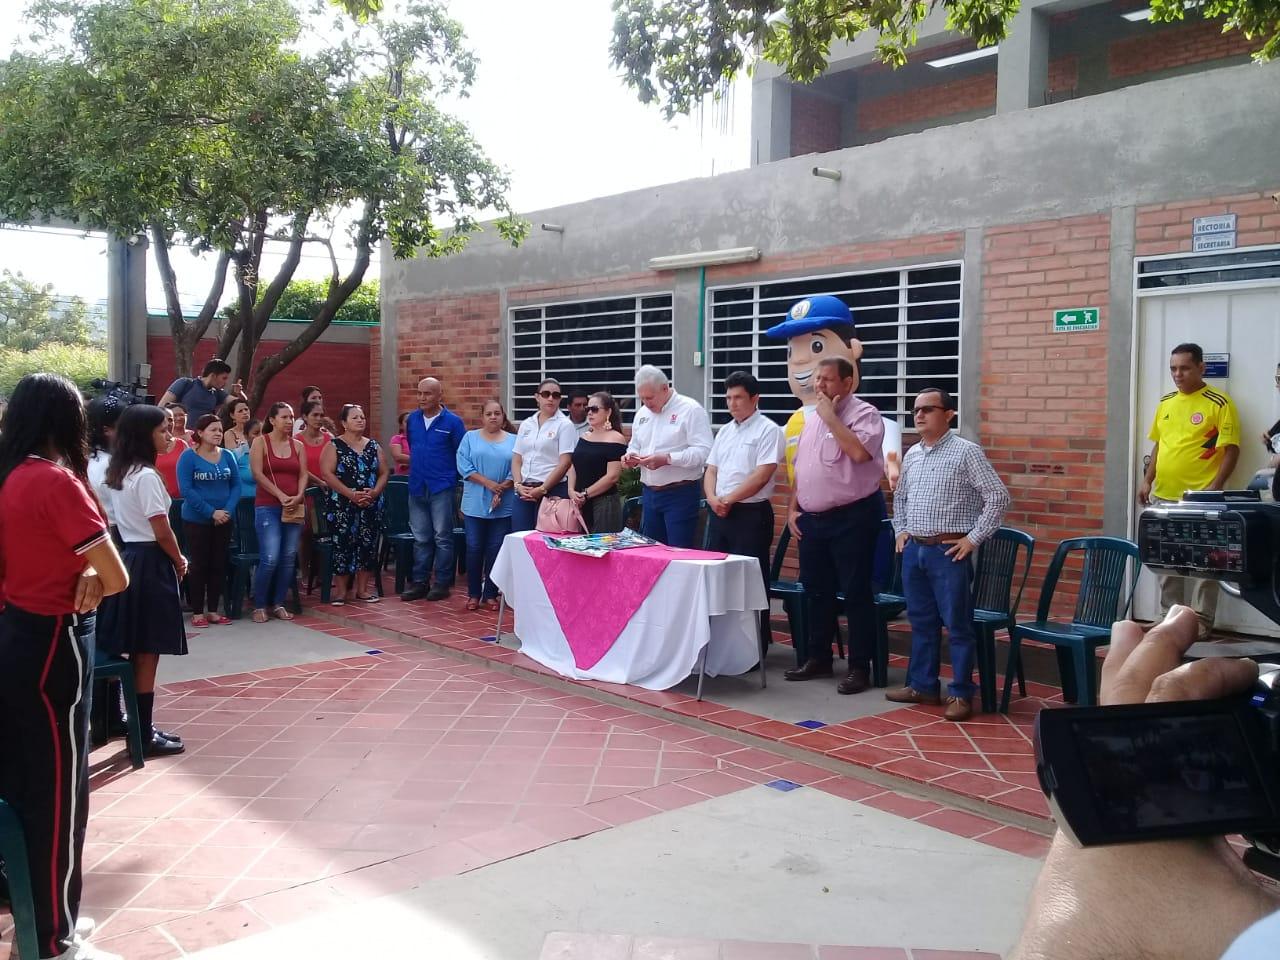 I.T. Carlos Ramirez